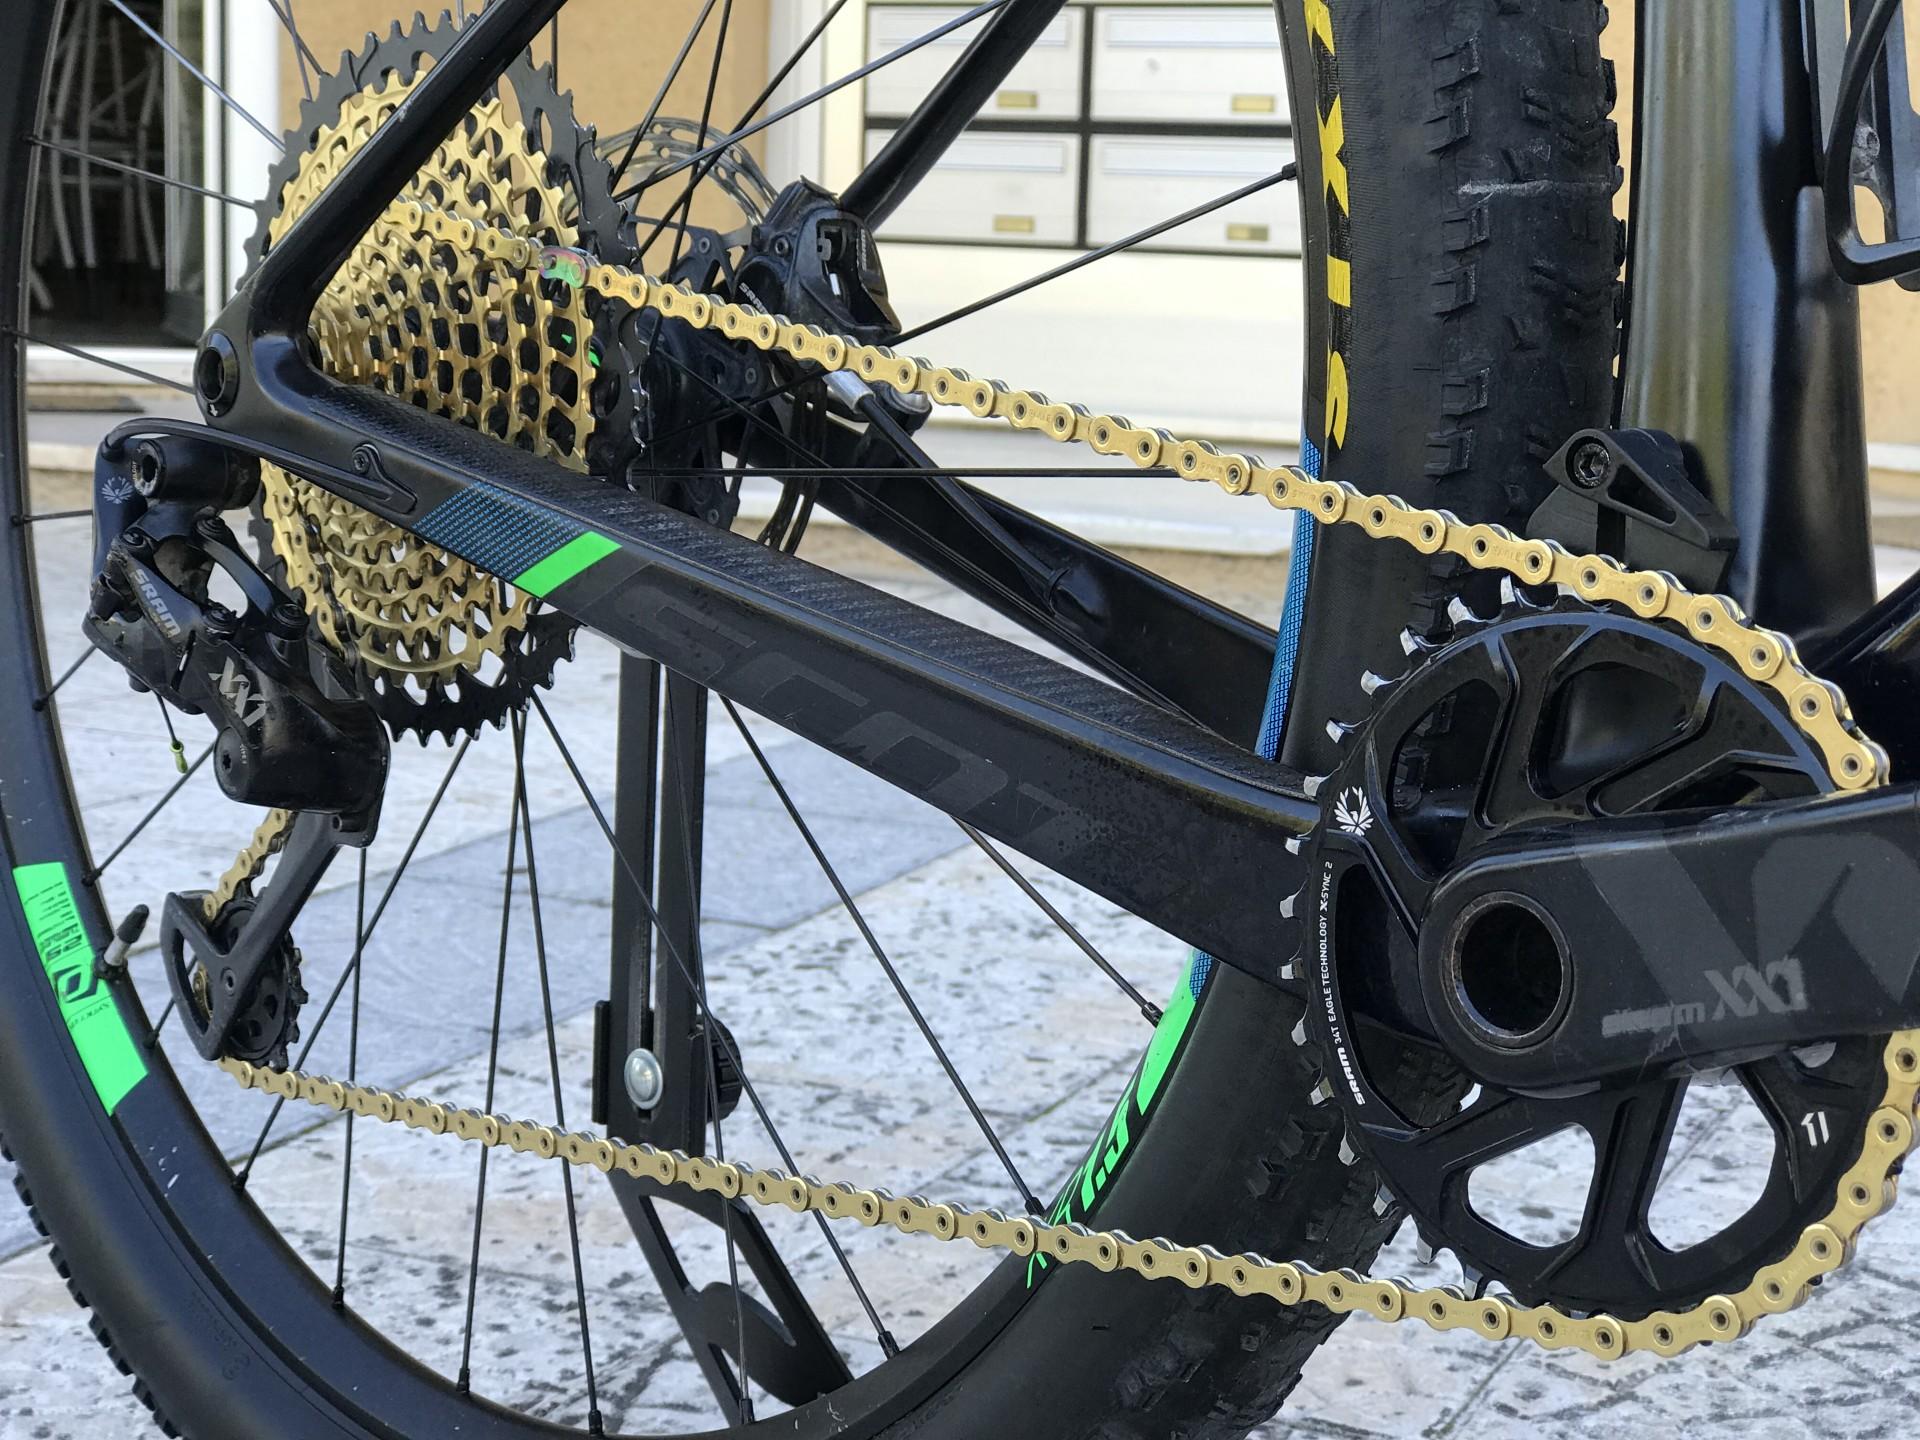 Bicicleta Scott Scale RC 900 Ultimate - usada